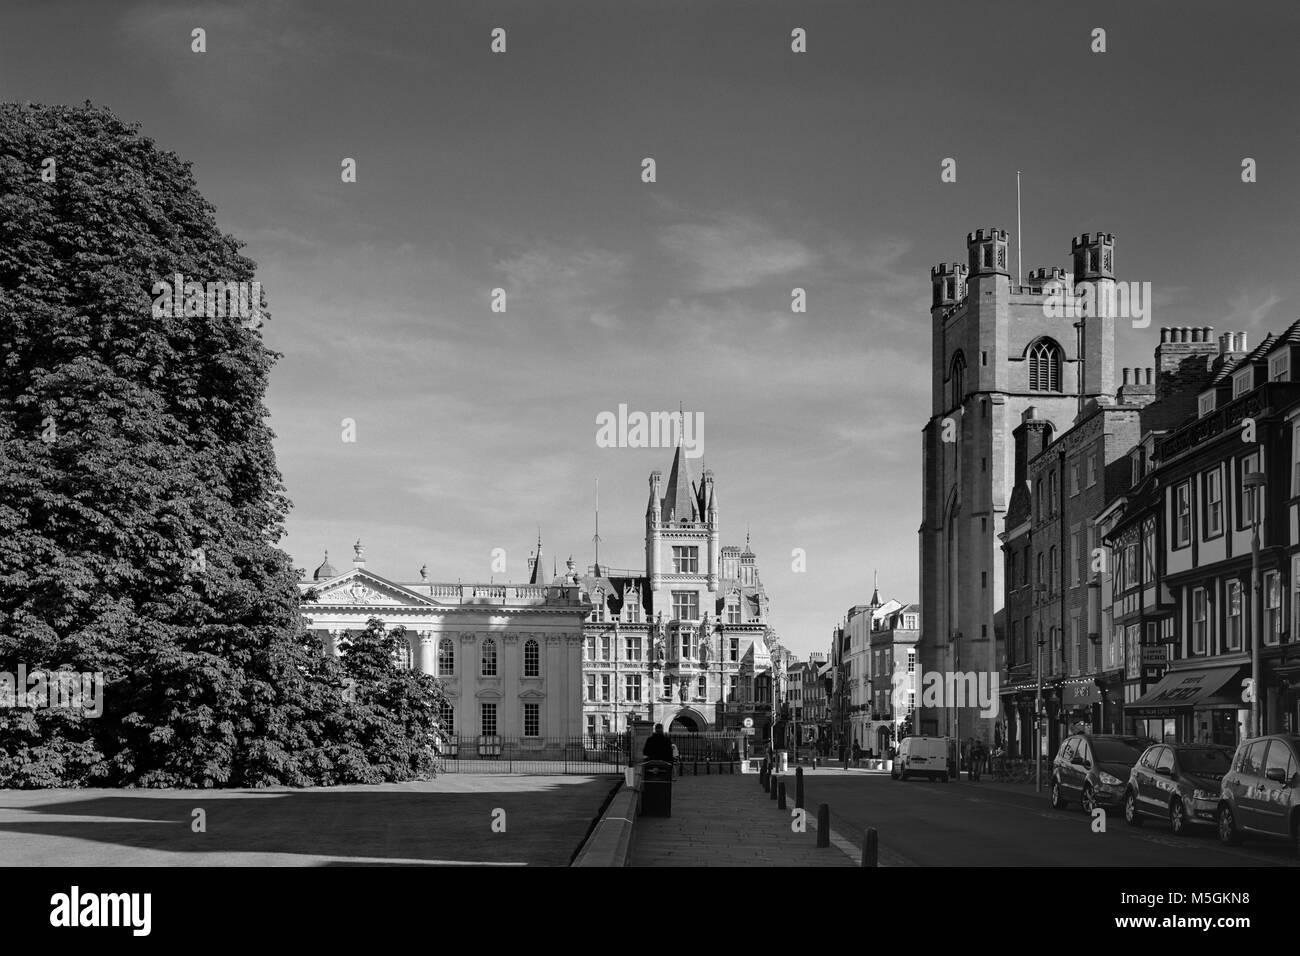 King's Parade Cambridge looking North - Stock Image